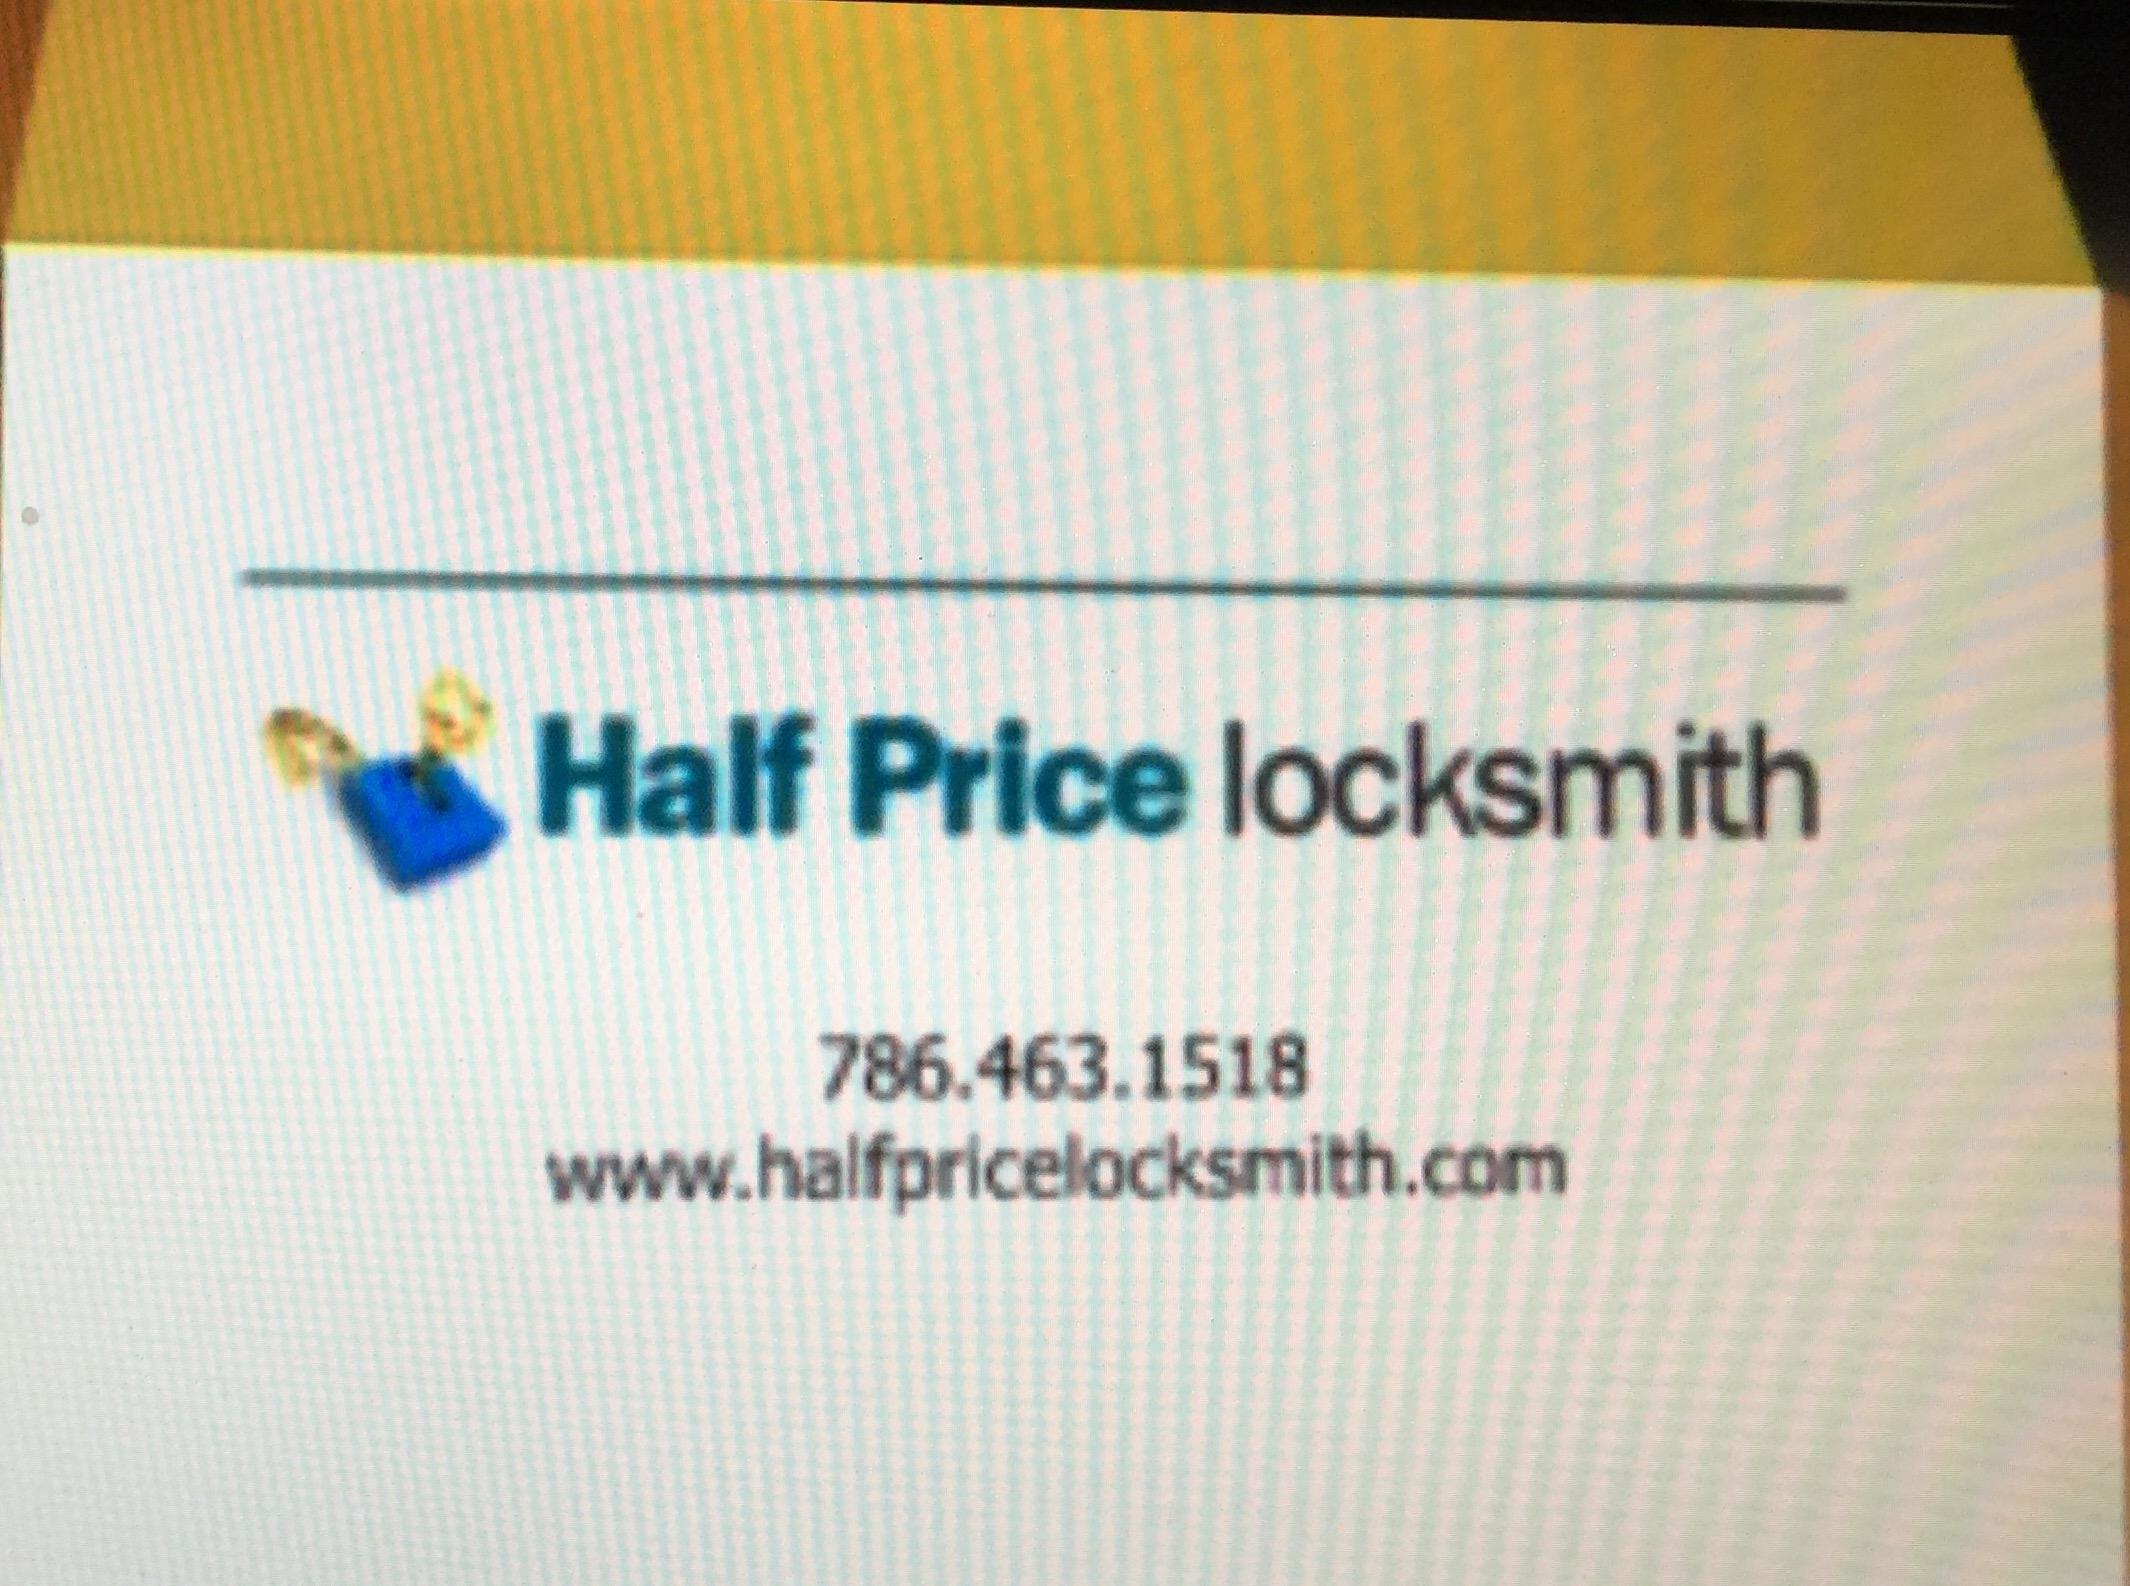 Half Price Locksmith image 16